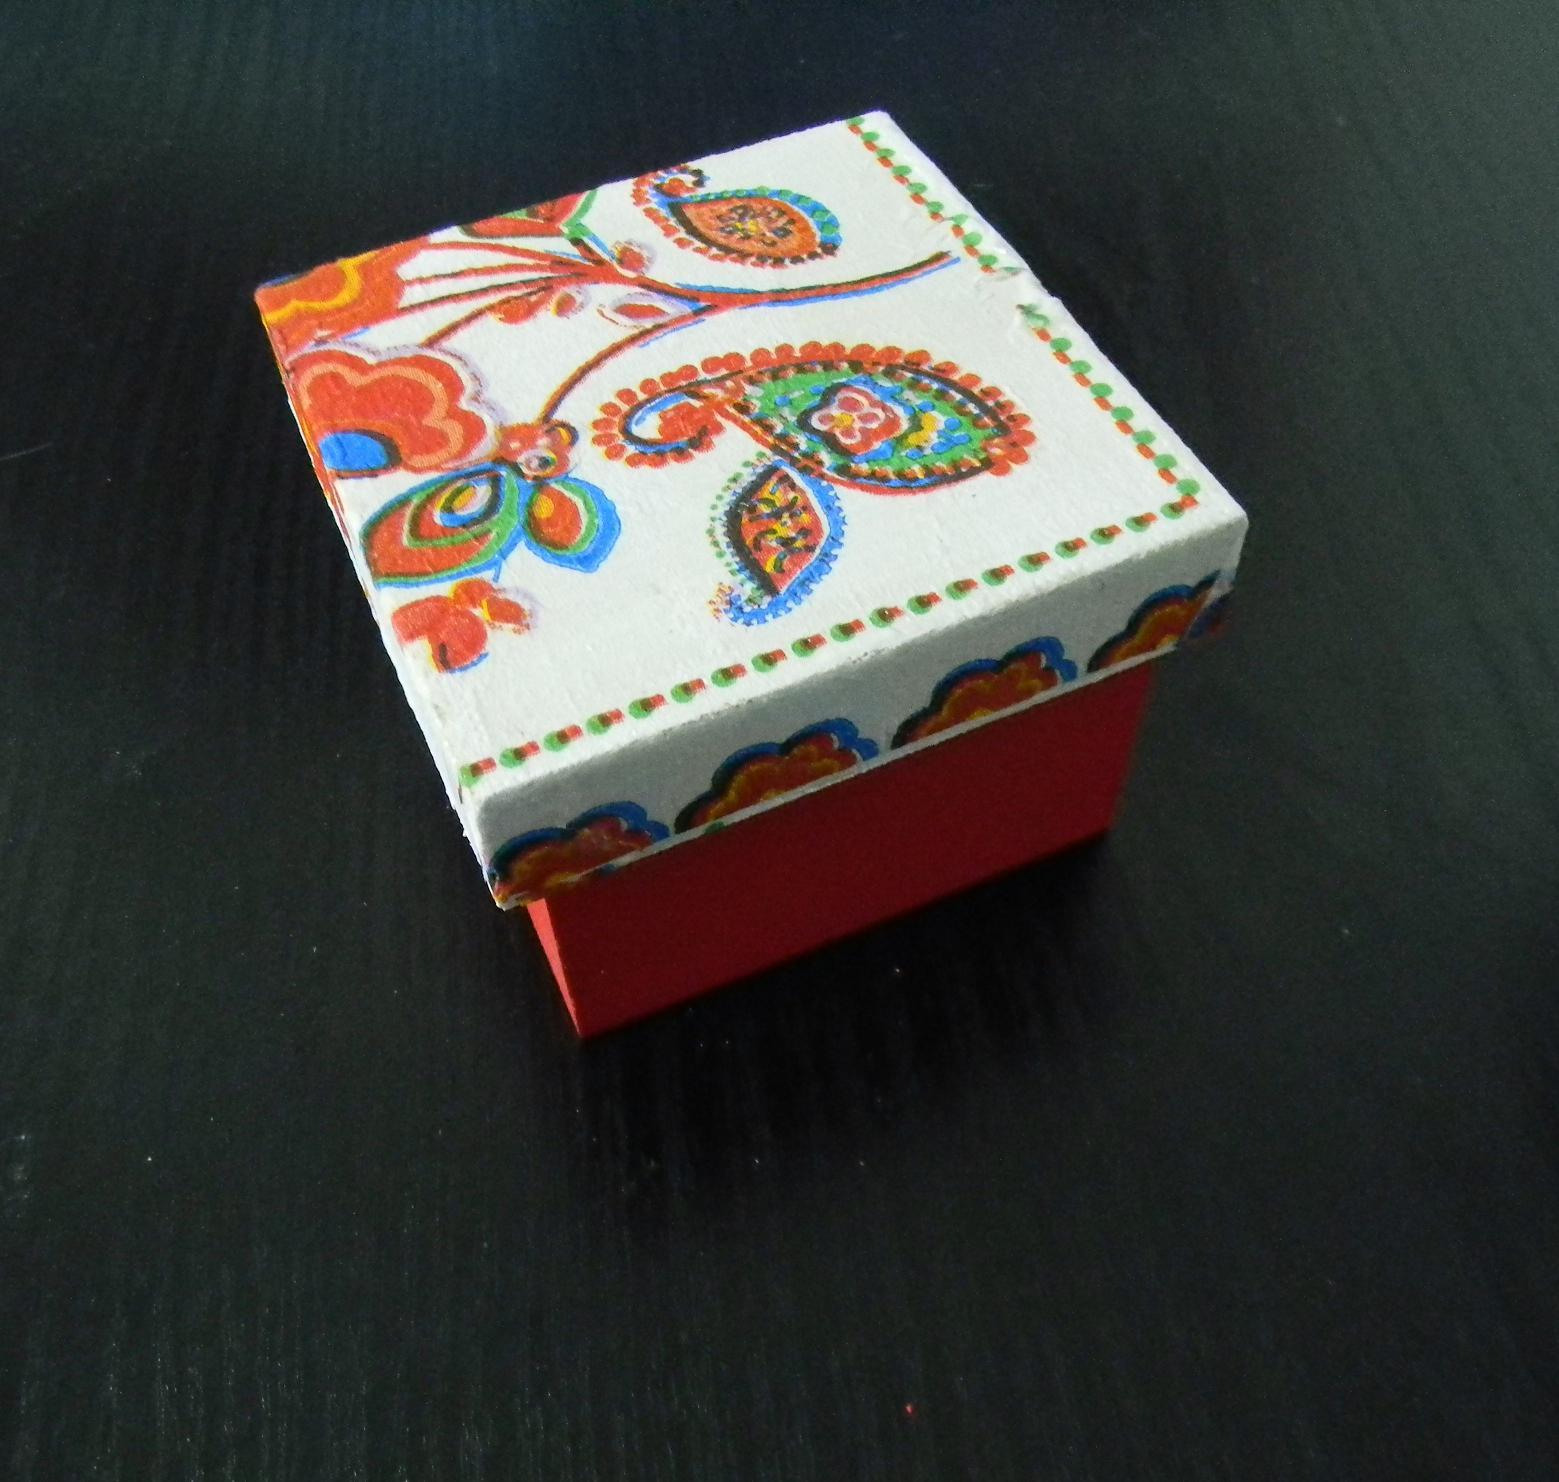 Lulu 39 s cajas medida 9 x 9 x 6 cm pintadas a mano con tapa - Cajas decoradas a mano ...